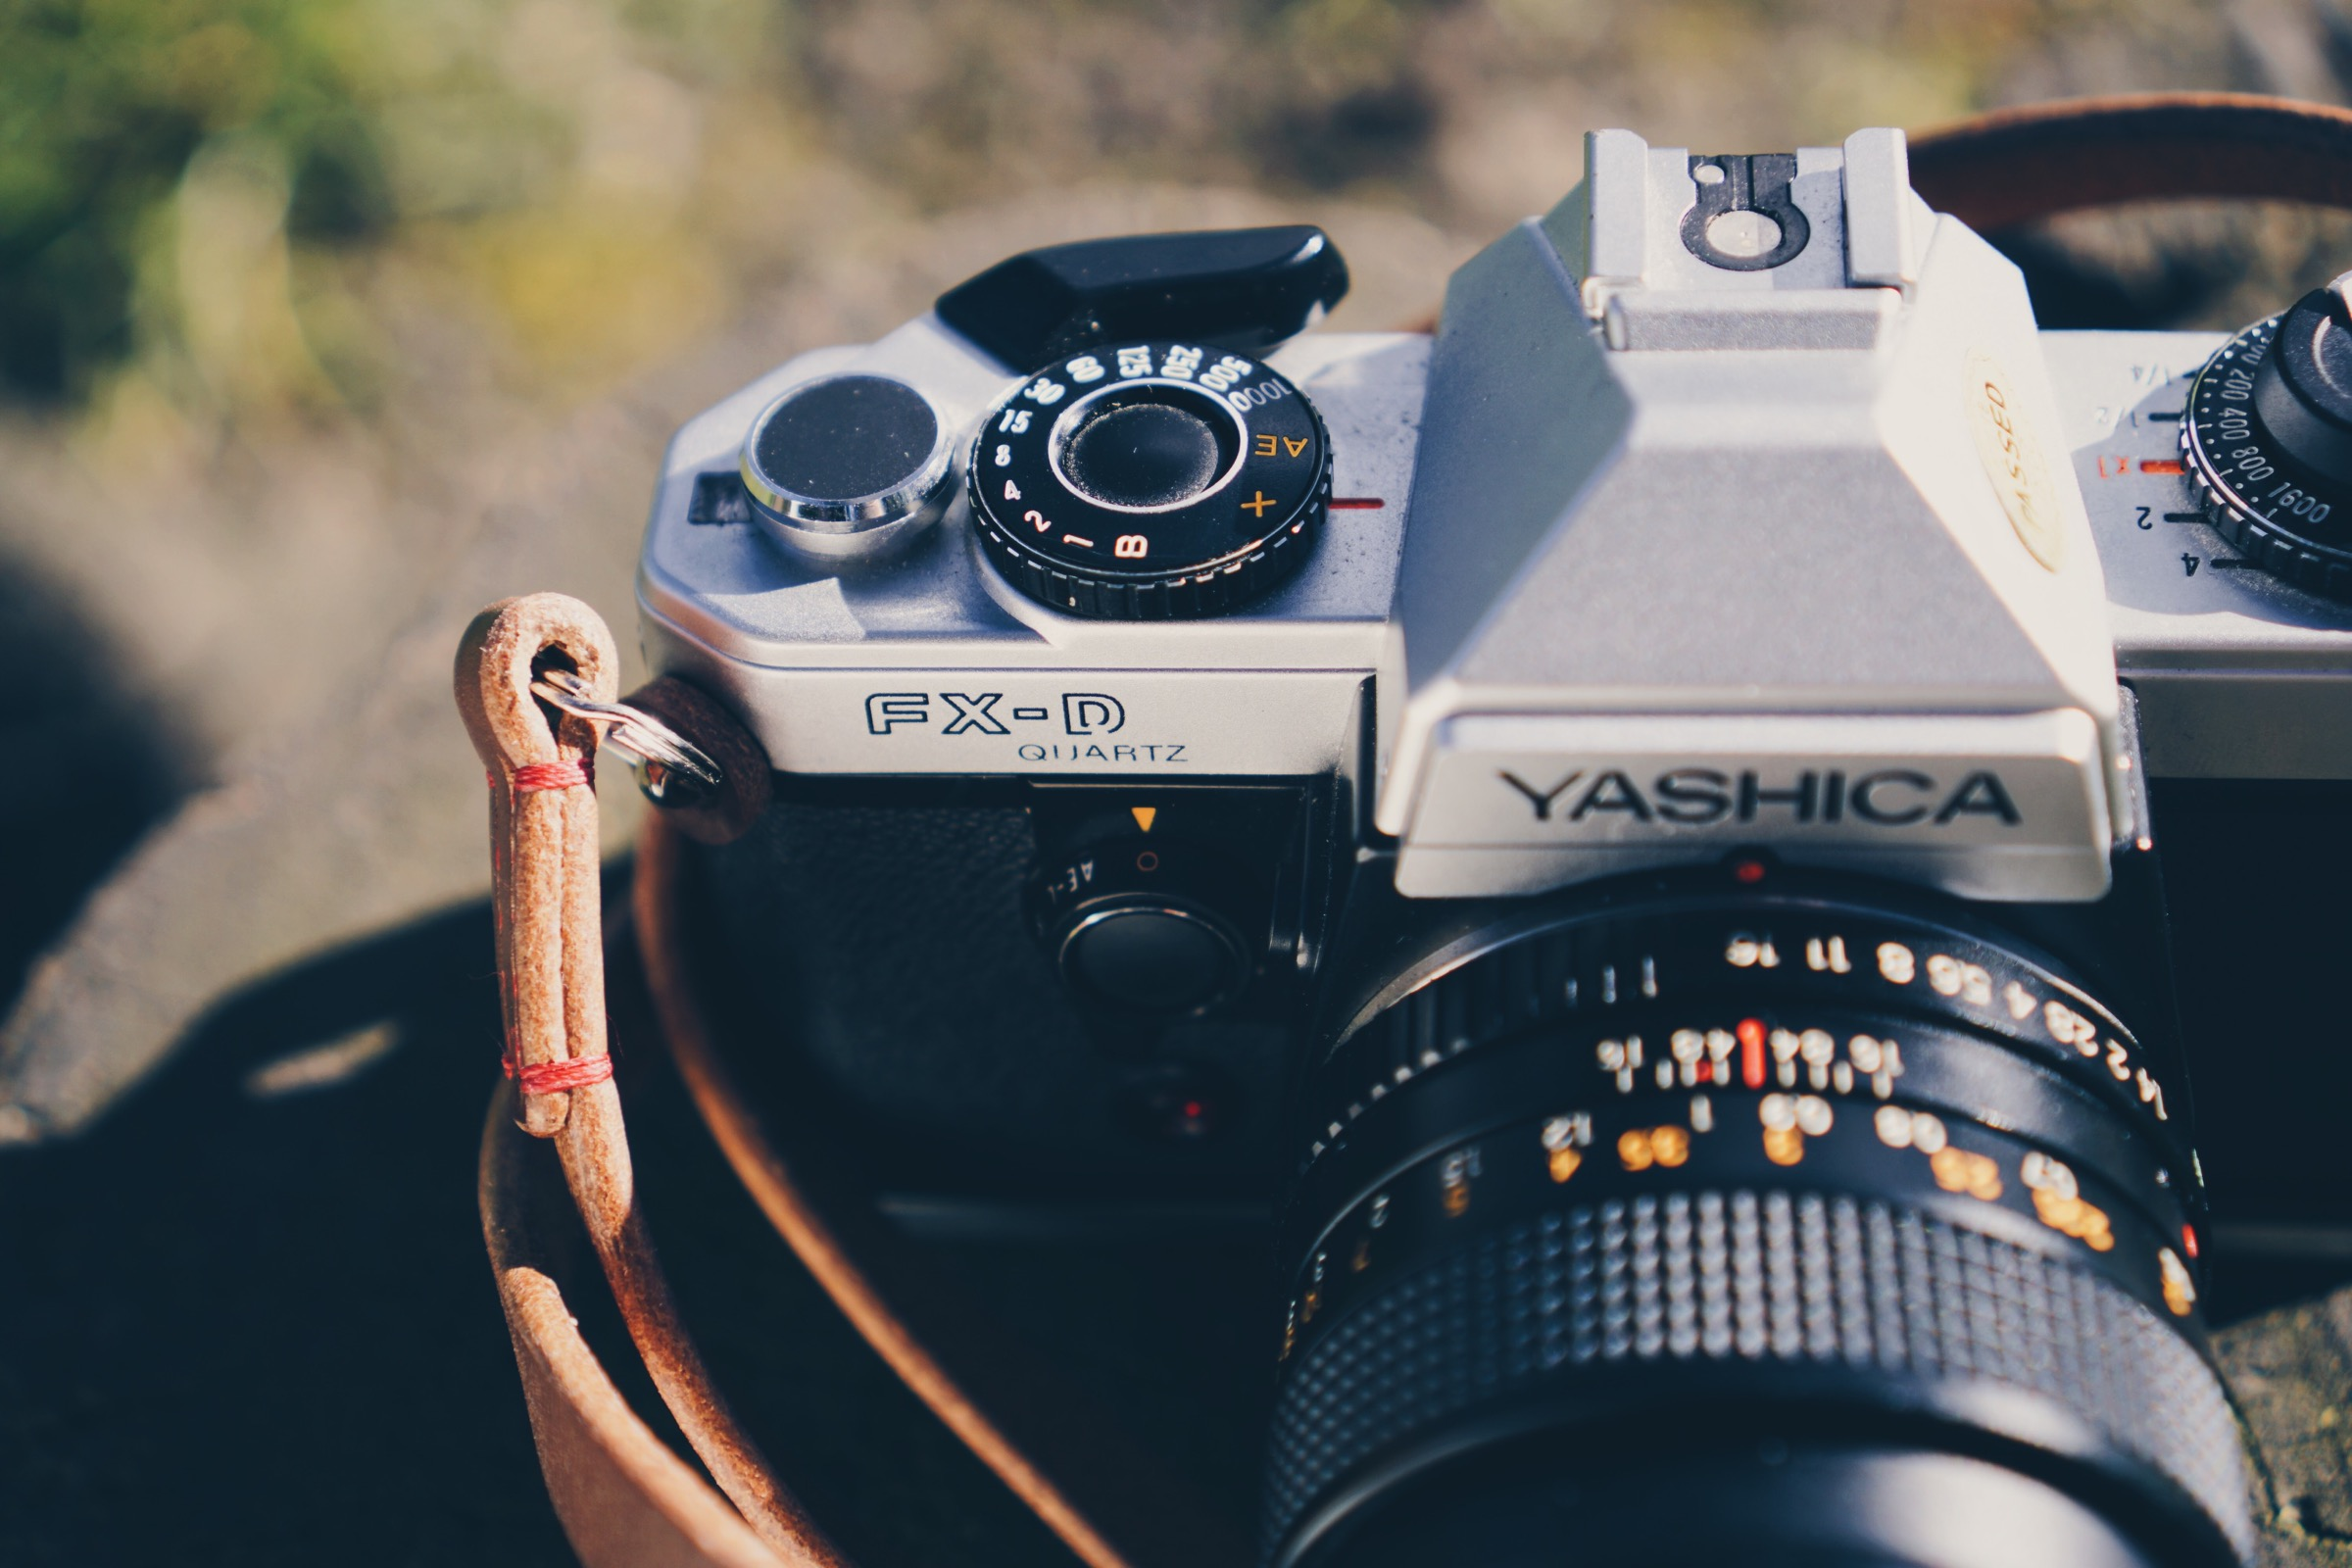 Handmade camera strap from etsy